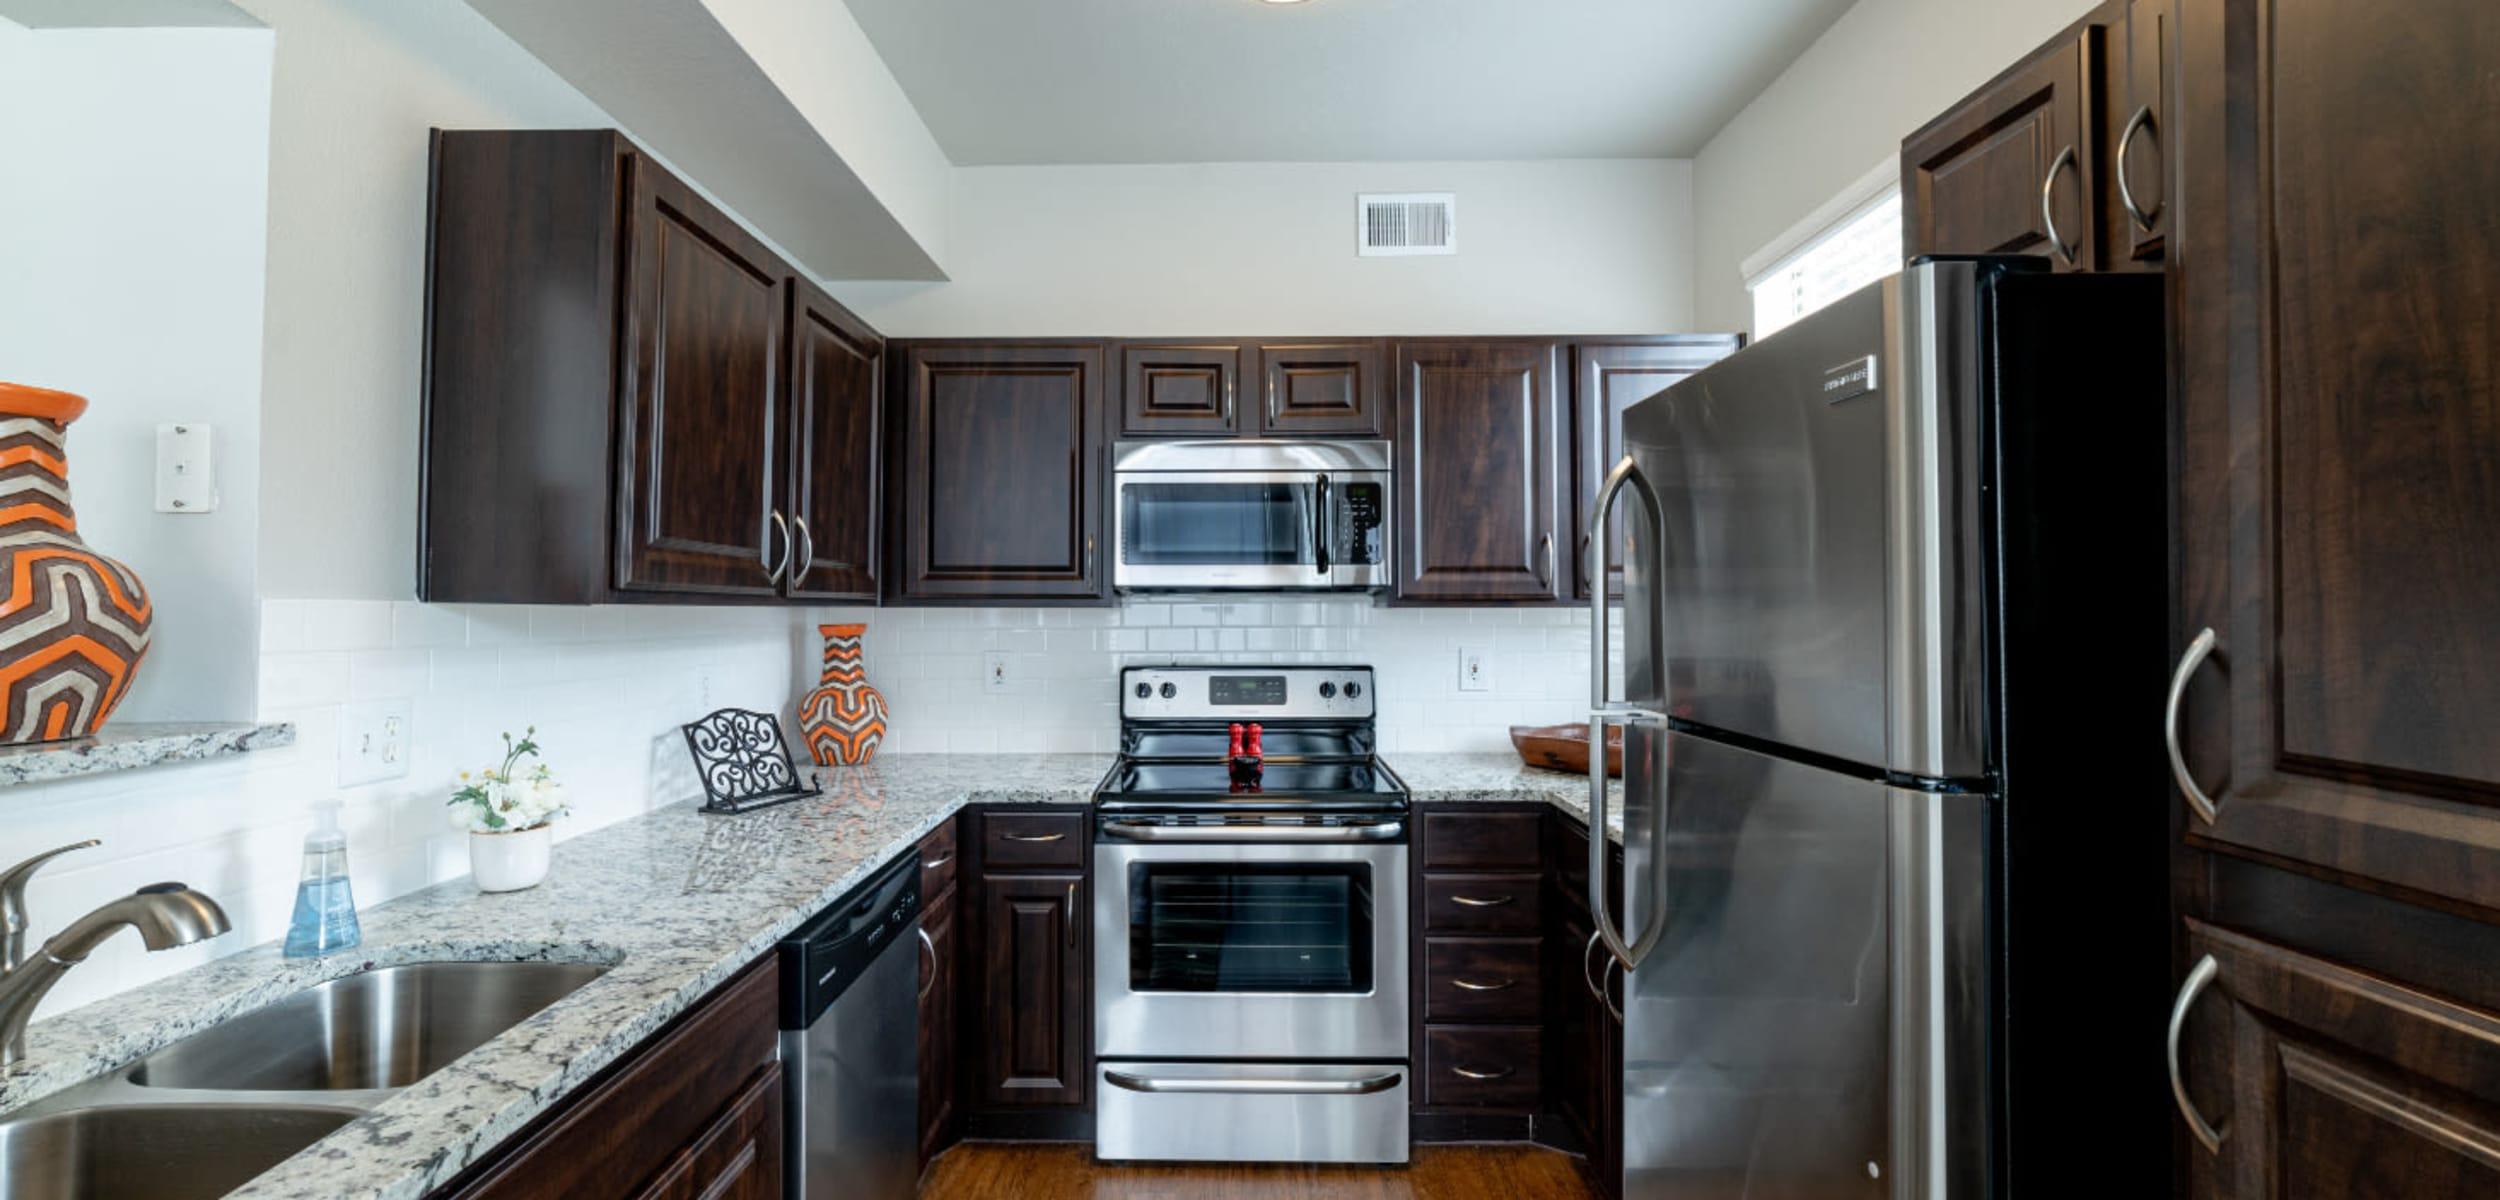 Modern, sleek kitchen at Marquis at Lantana in Flower Mound, Texas